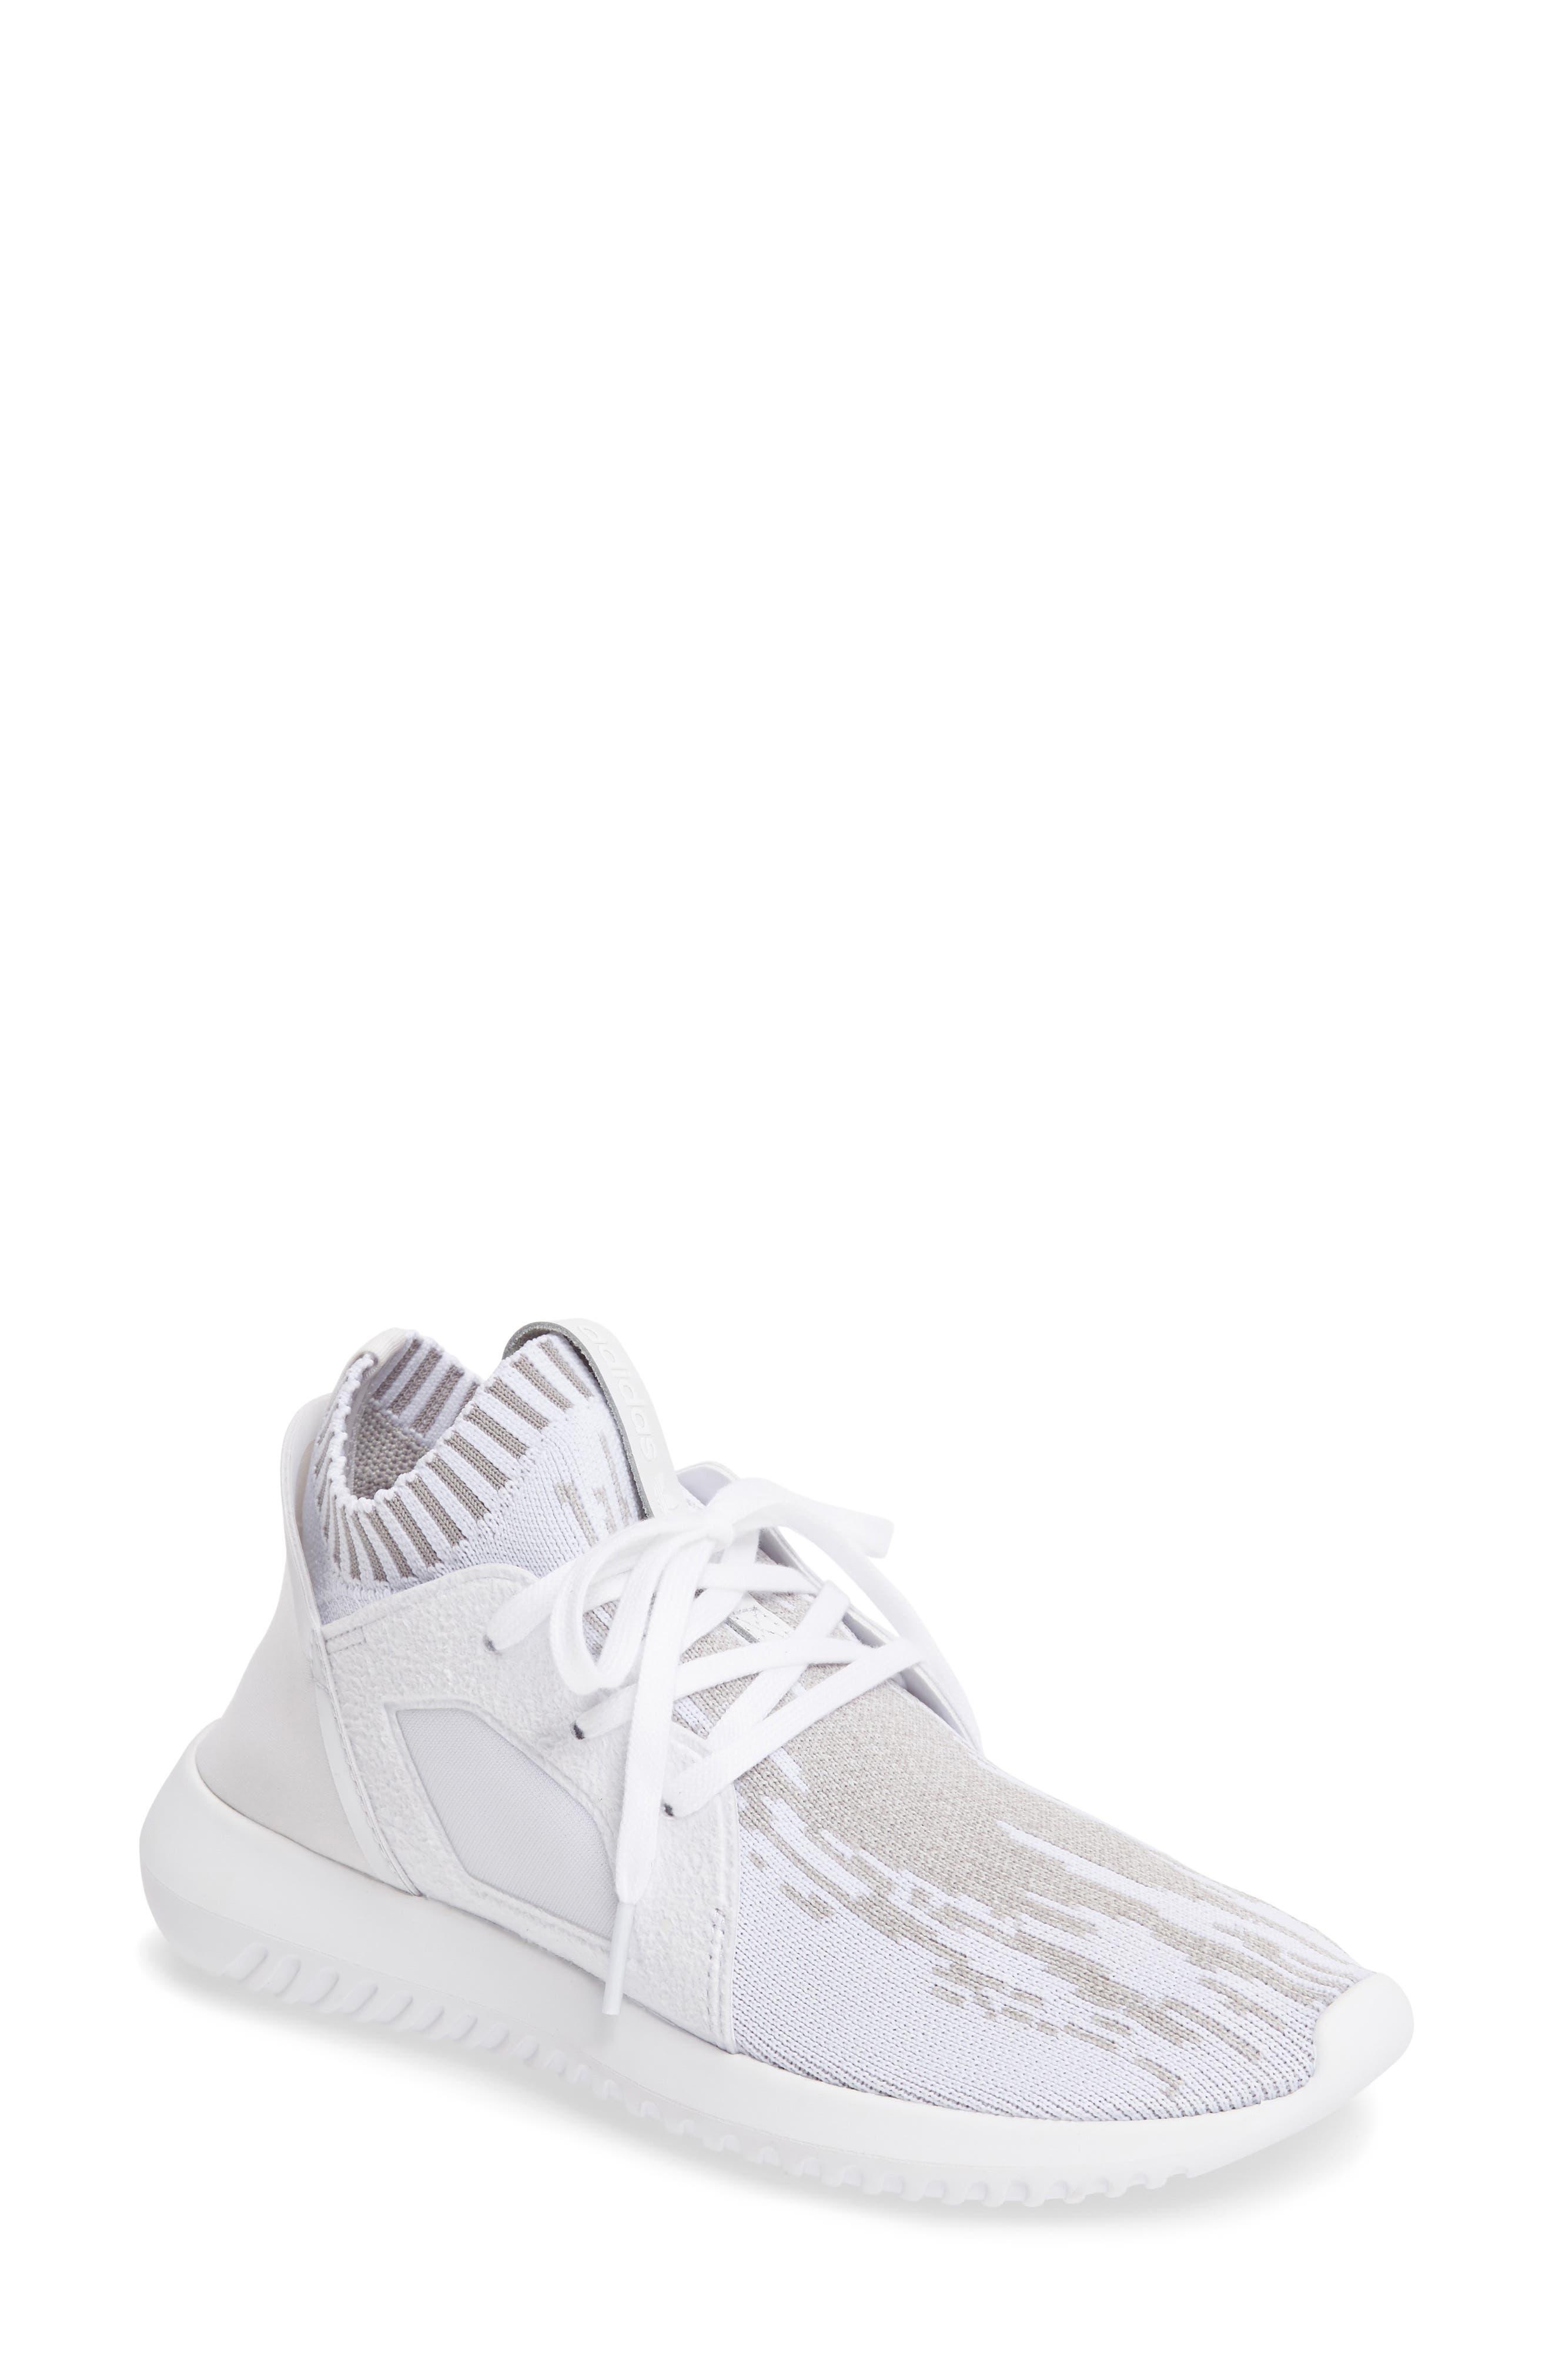 Main Image - adidas Tubular Defiant Sneaker (Women)